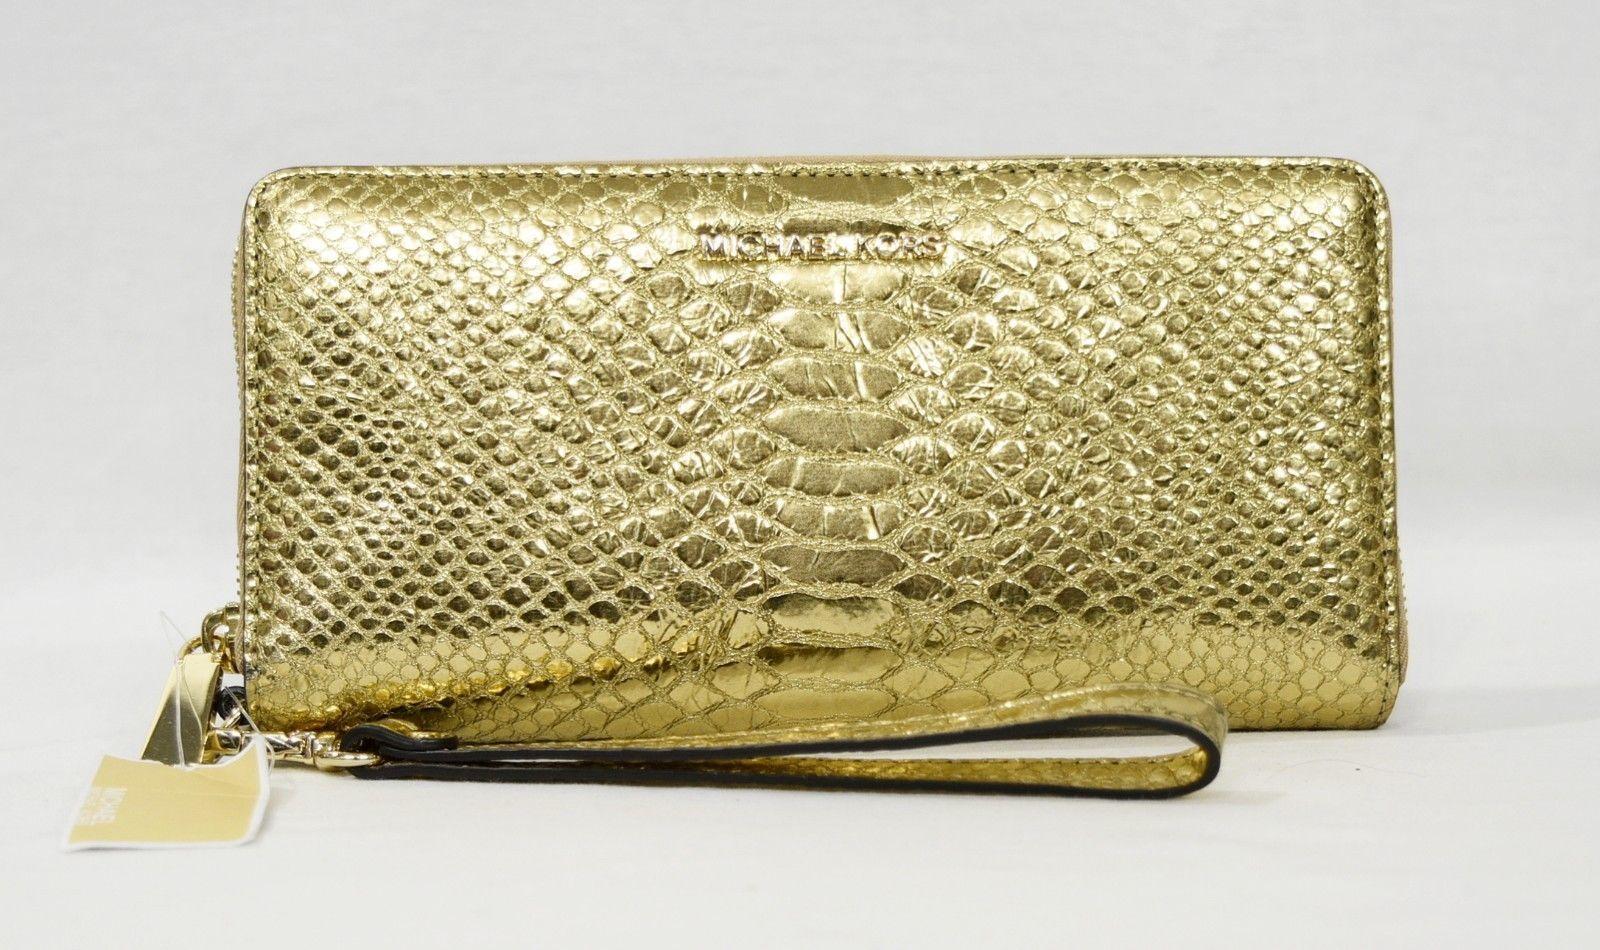 101e3d005ce05 Michael Kors Jet Set Travel Metallic Snake-Embossed-Leather Continental  Wristlet